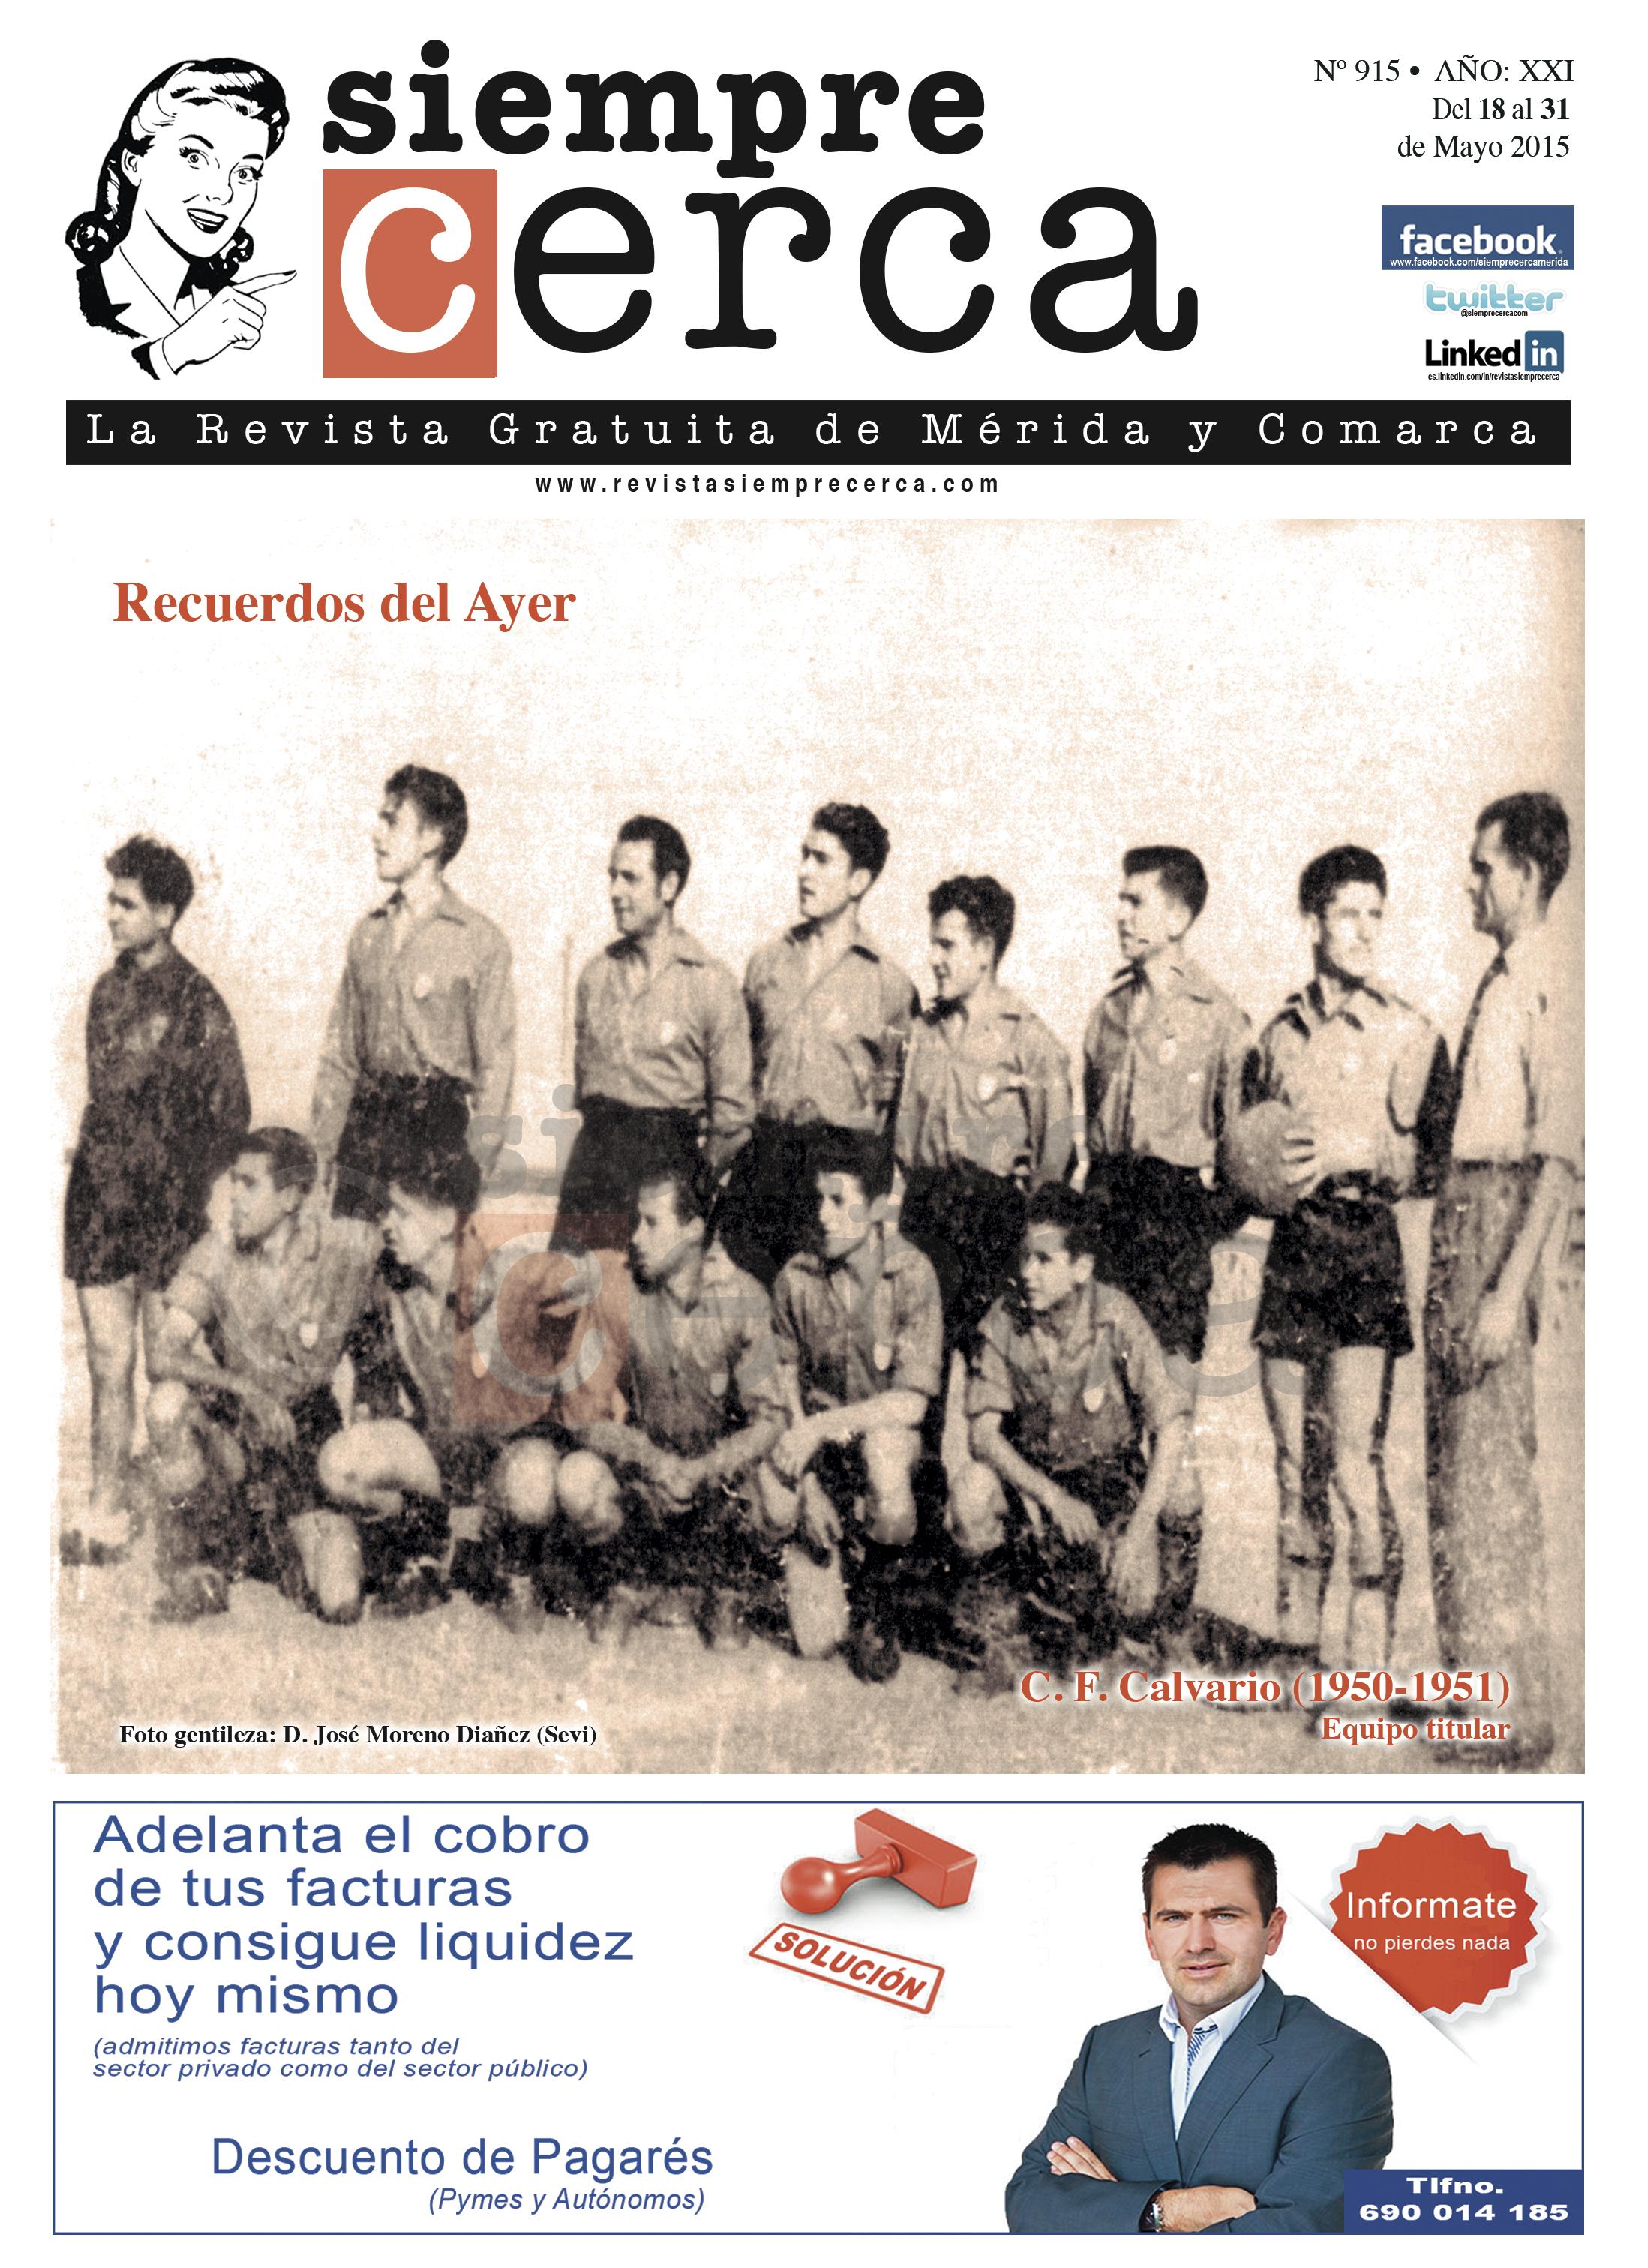 1950. Mérida. Fotos Antiguas